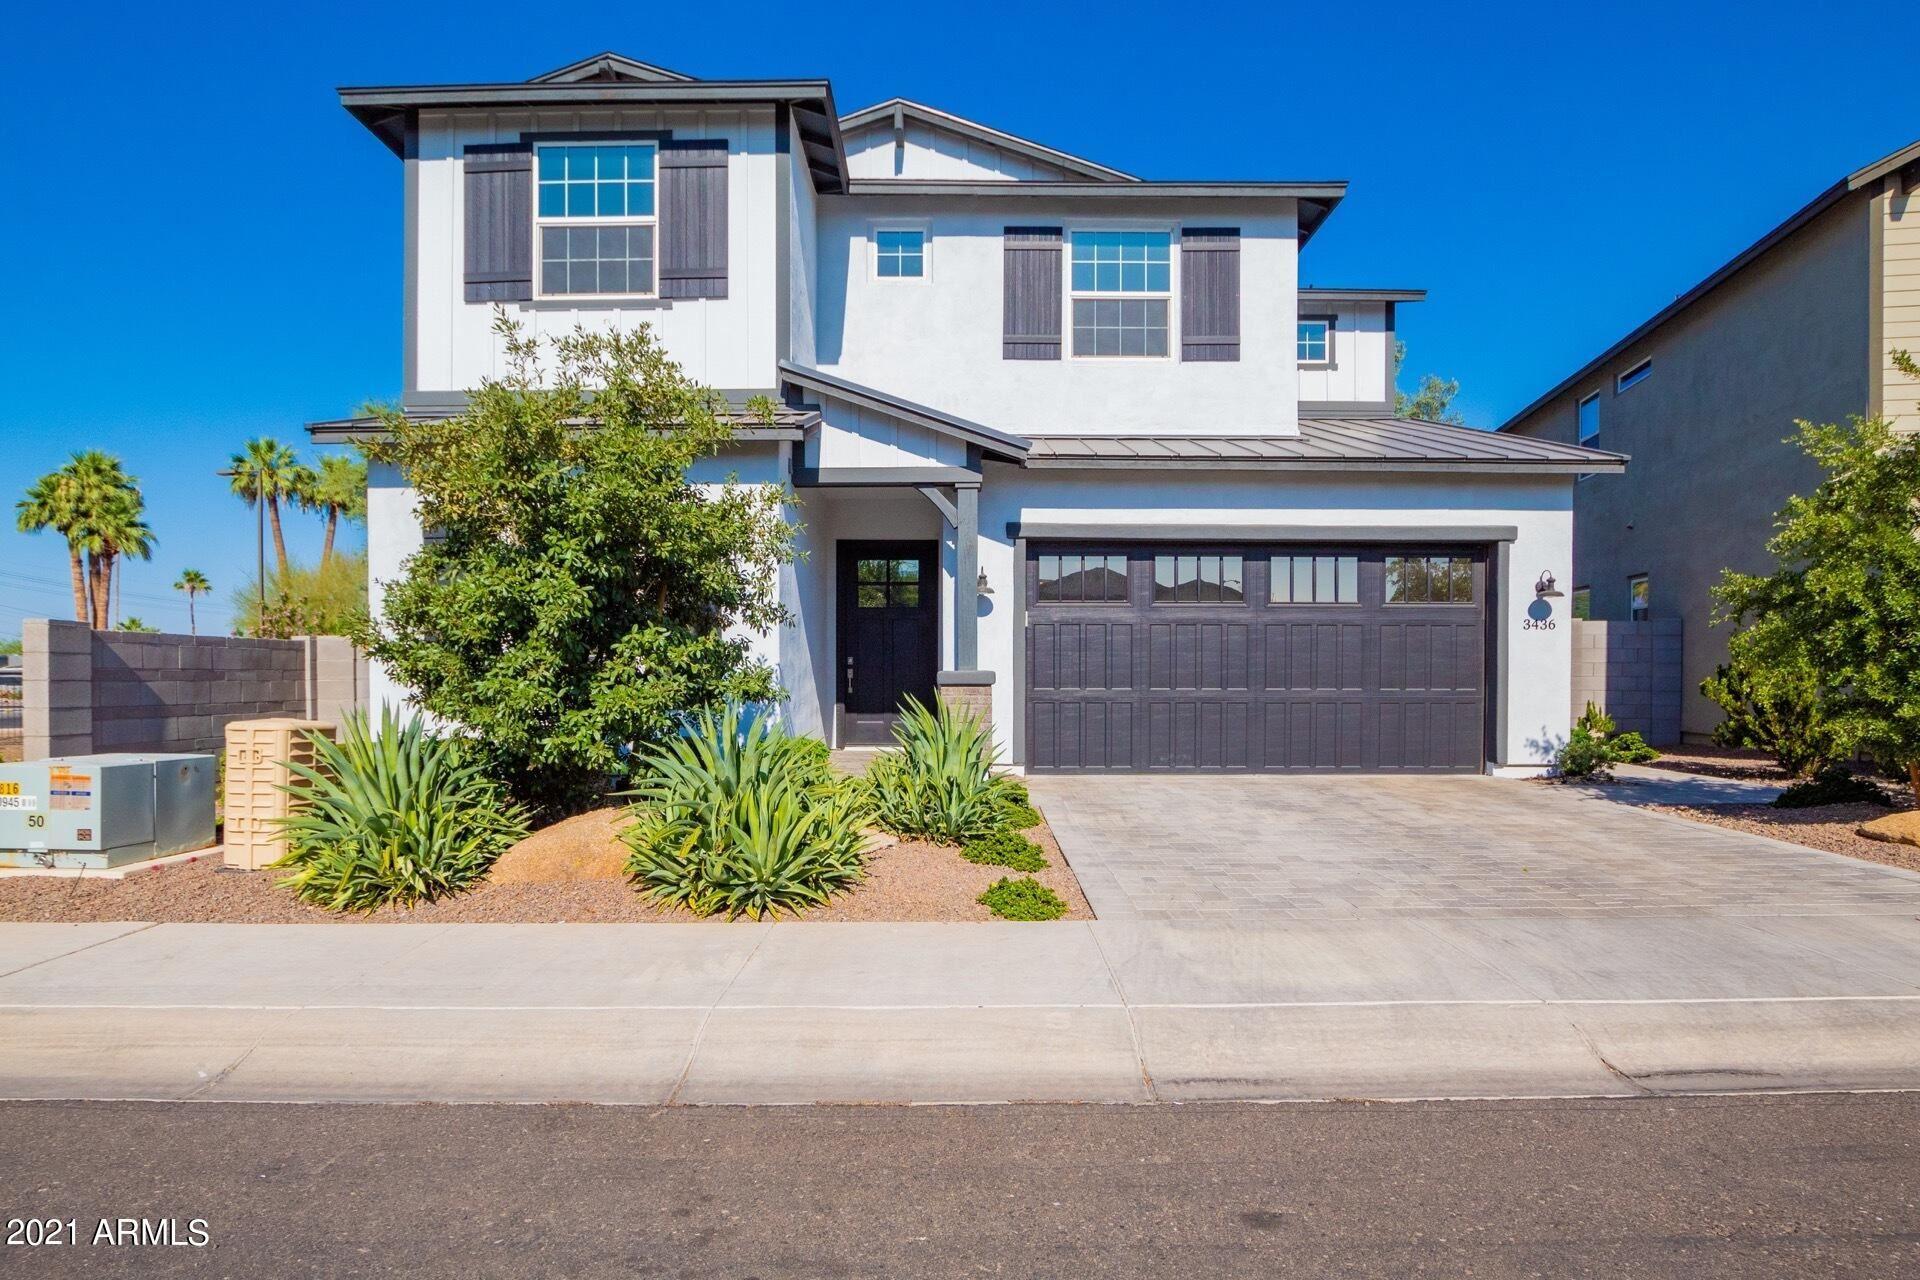 3436 N 38TH Place, Phoenix, AZ 85018 - MLS#: 6242189